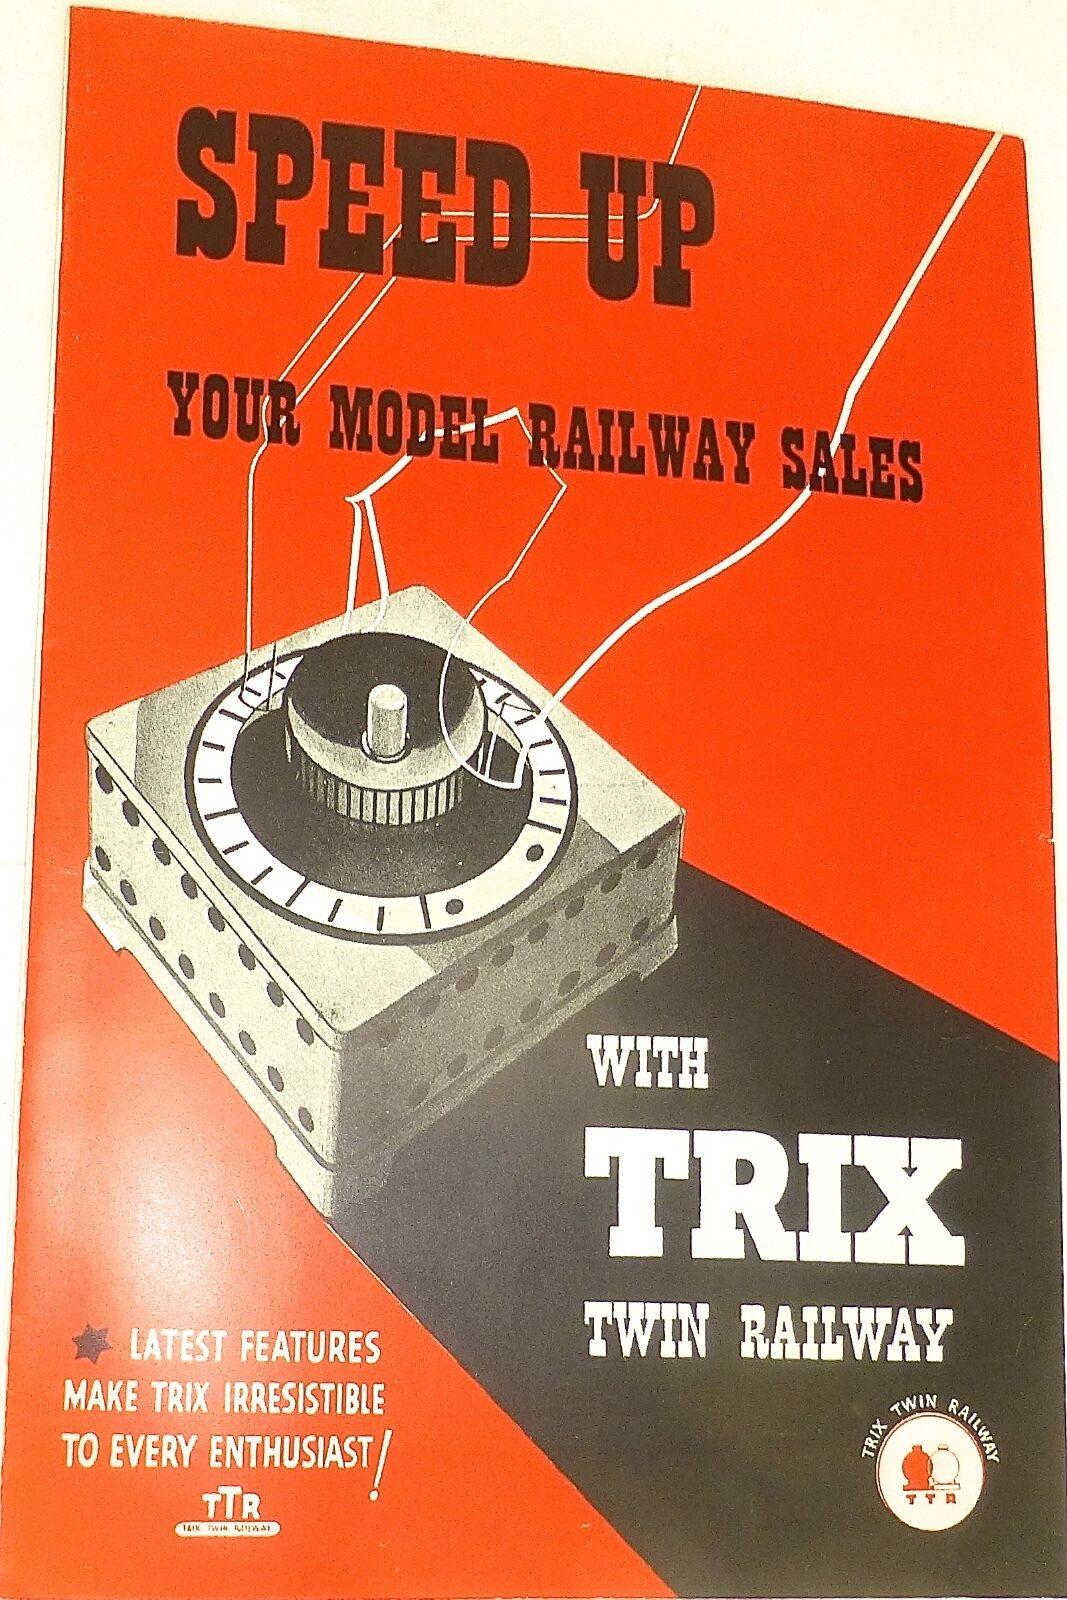 Speed Up Your Modelo Railway Ventas con Trix Twin Ttr Folleto Å